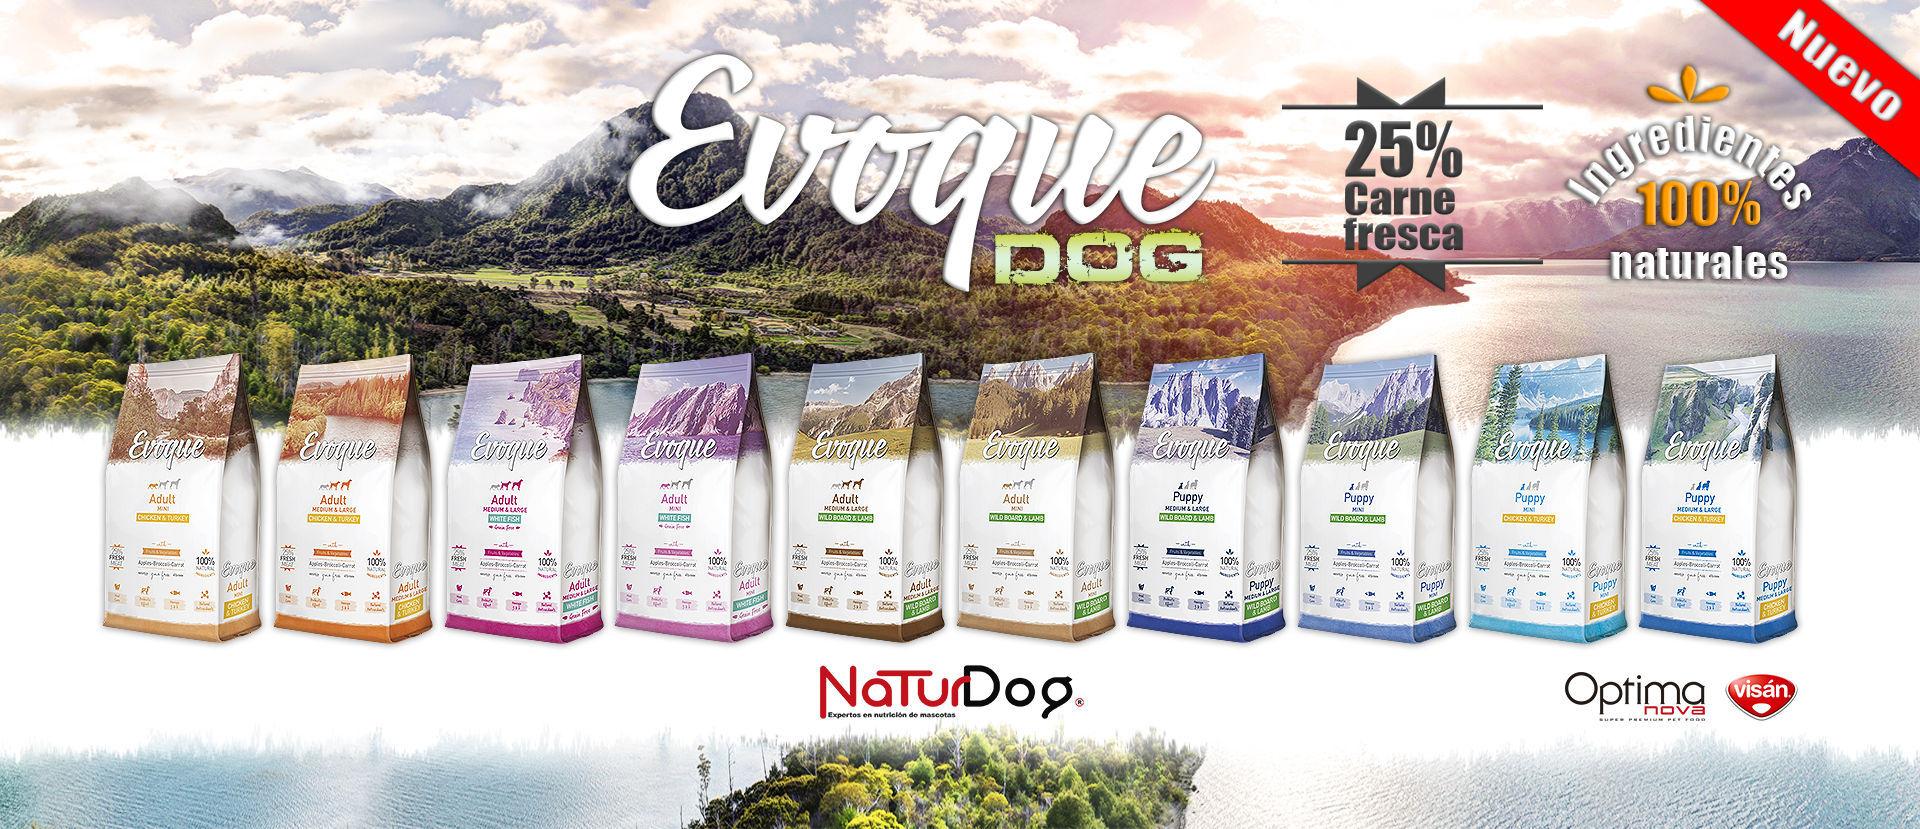 Evoque dog nueva gama alimentacion perros Visan NaturDog